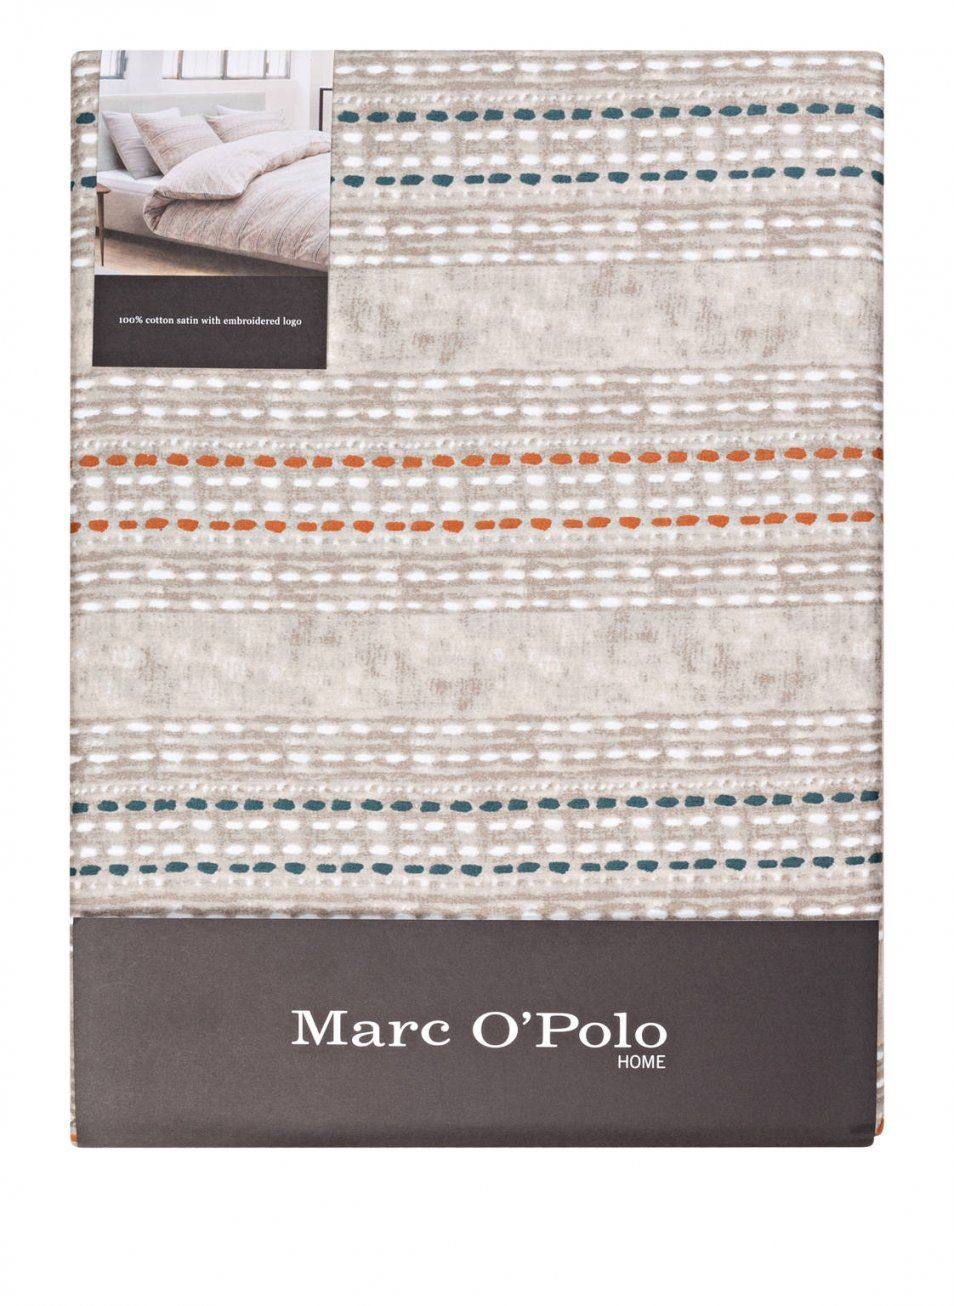 Marco Polo Brille Braun Holzoptik Marc O Polo Bettwäsche Arvika Von